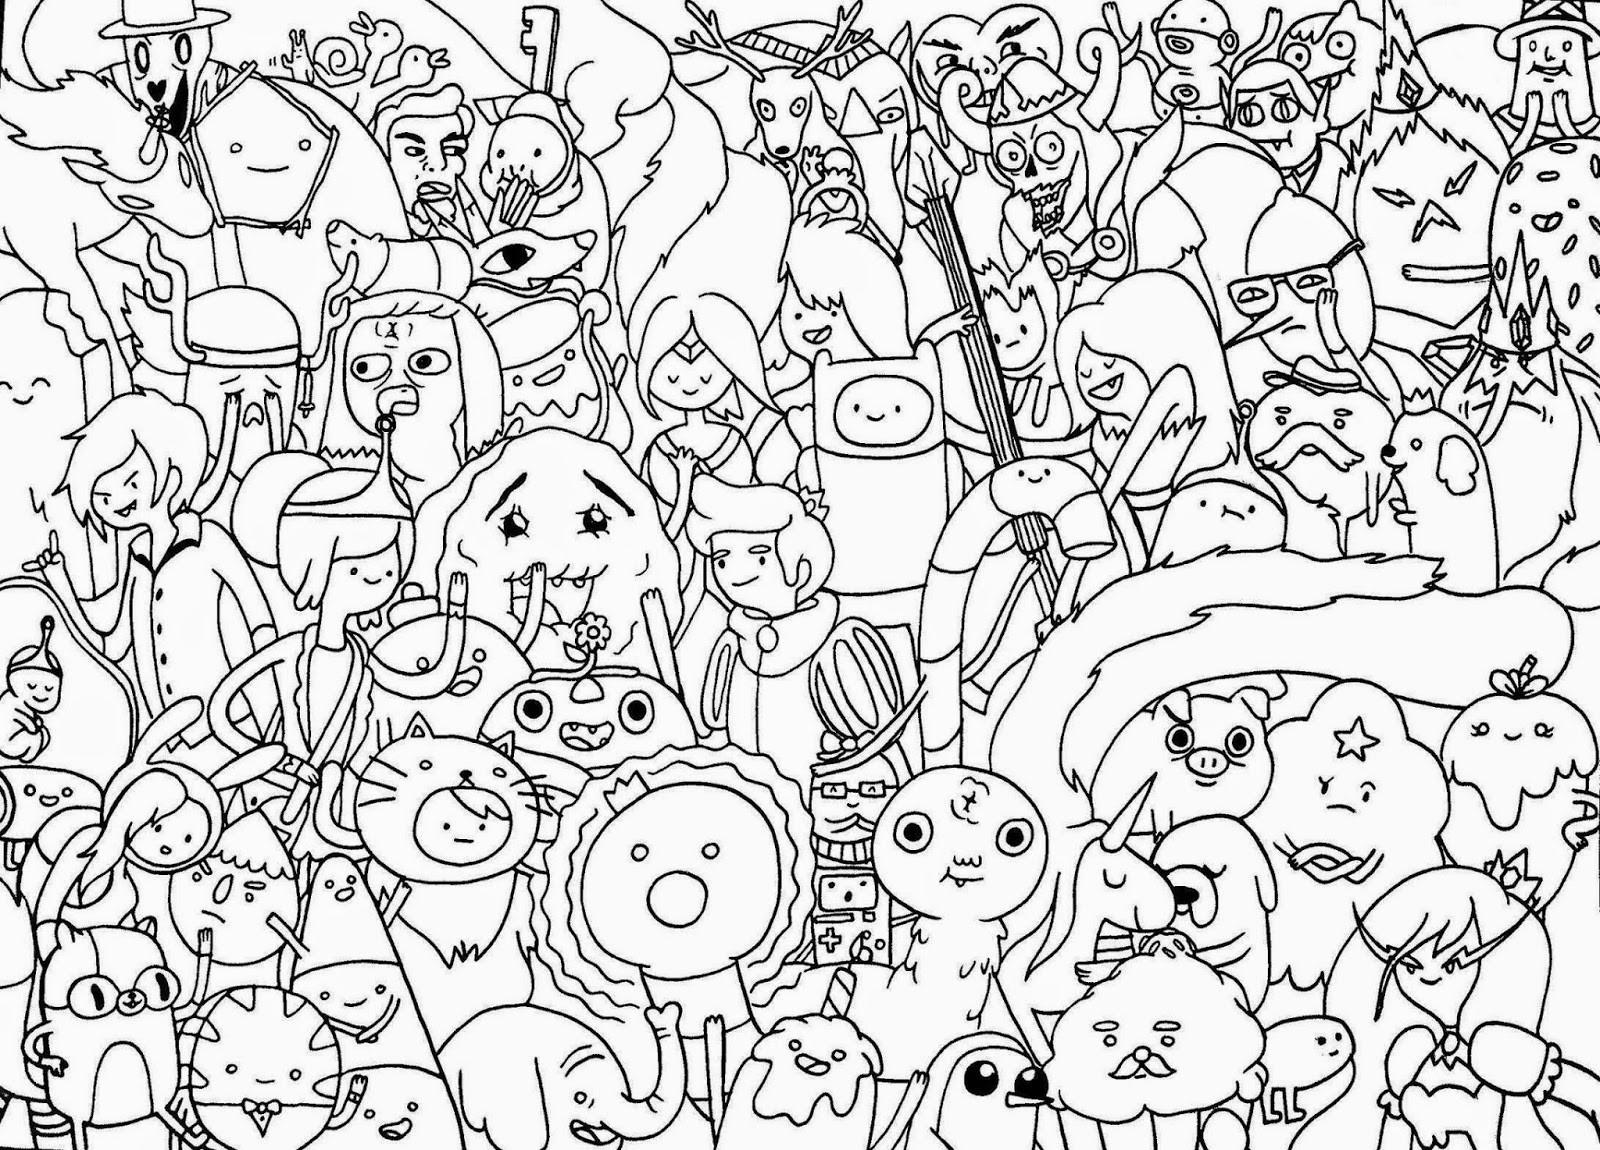 20 besten ideen tumblr ausmalbilder  beste wohnkultur